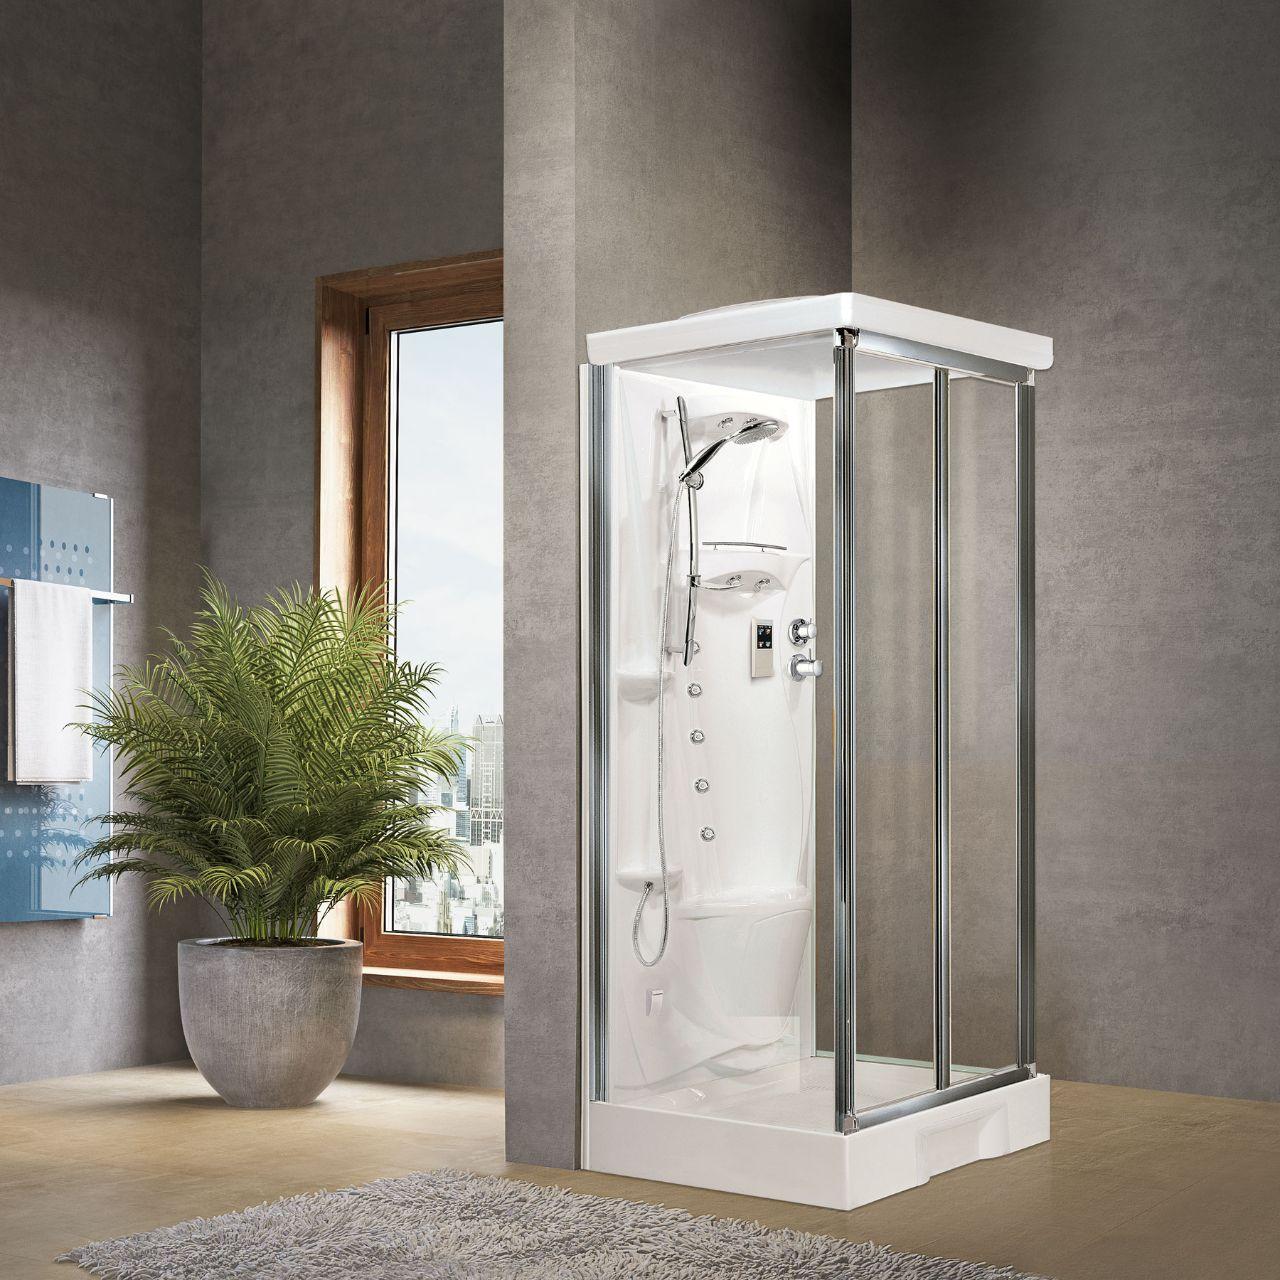 cabines de douche new holiday s2f 100x80 hydro novellini. Black Bedroom Furniture Sets. Home Design Ideas